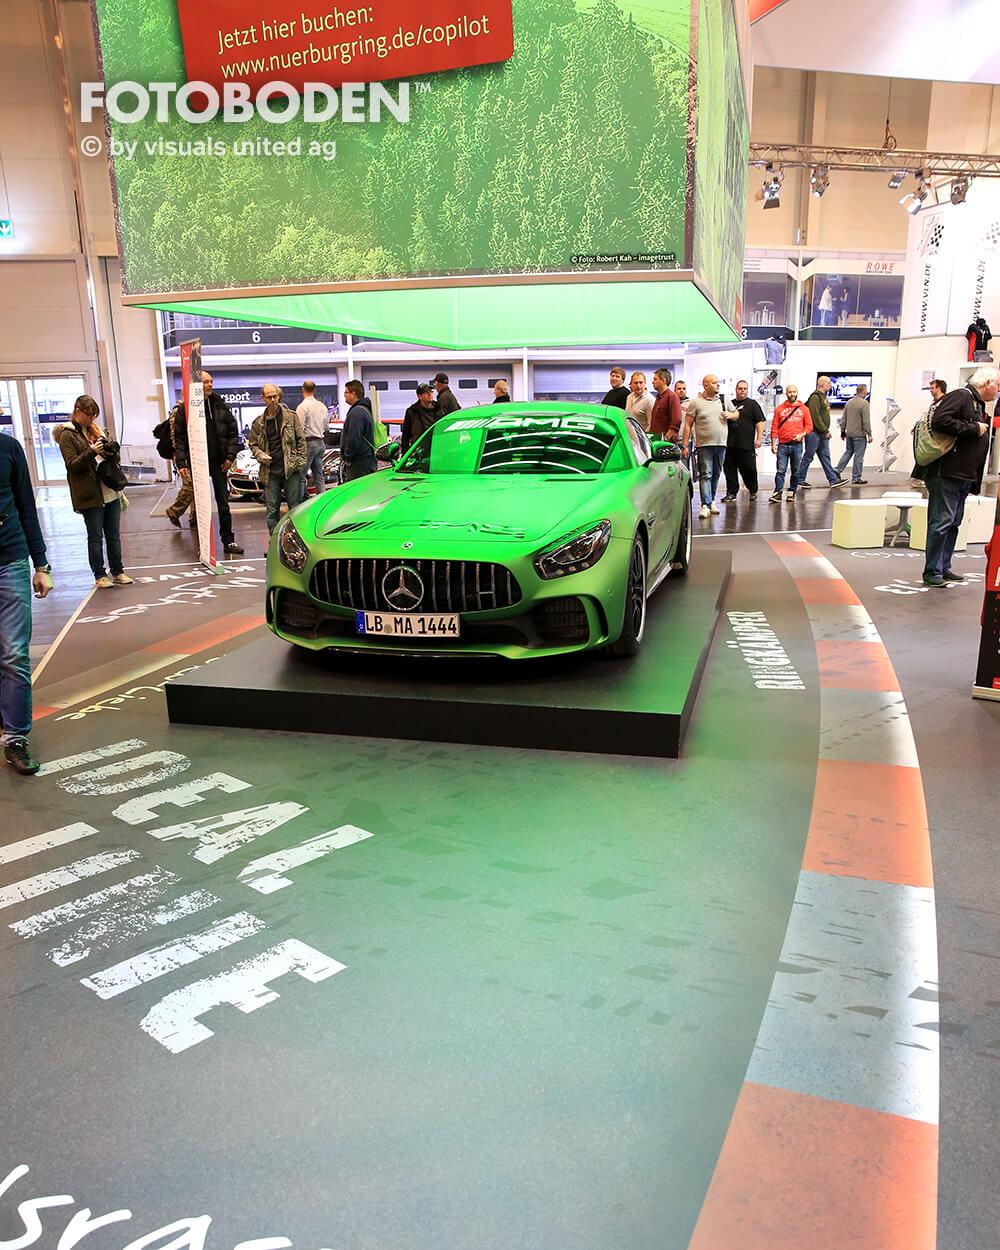 Motorshow Essen Fotoboden Messeboden Tradeshow Flooring Bodengestaltung Messe Bodendesign Messedesign Design Boden Messegestaltung1